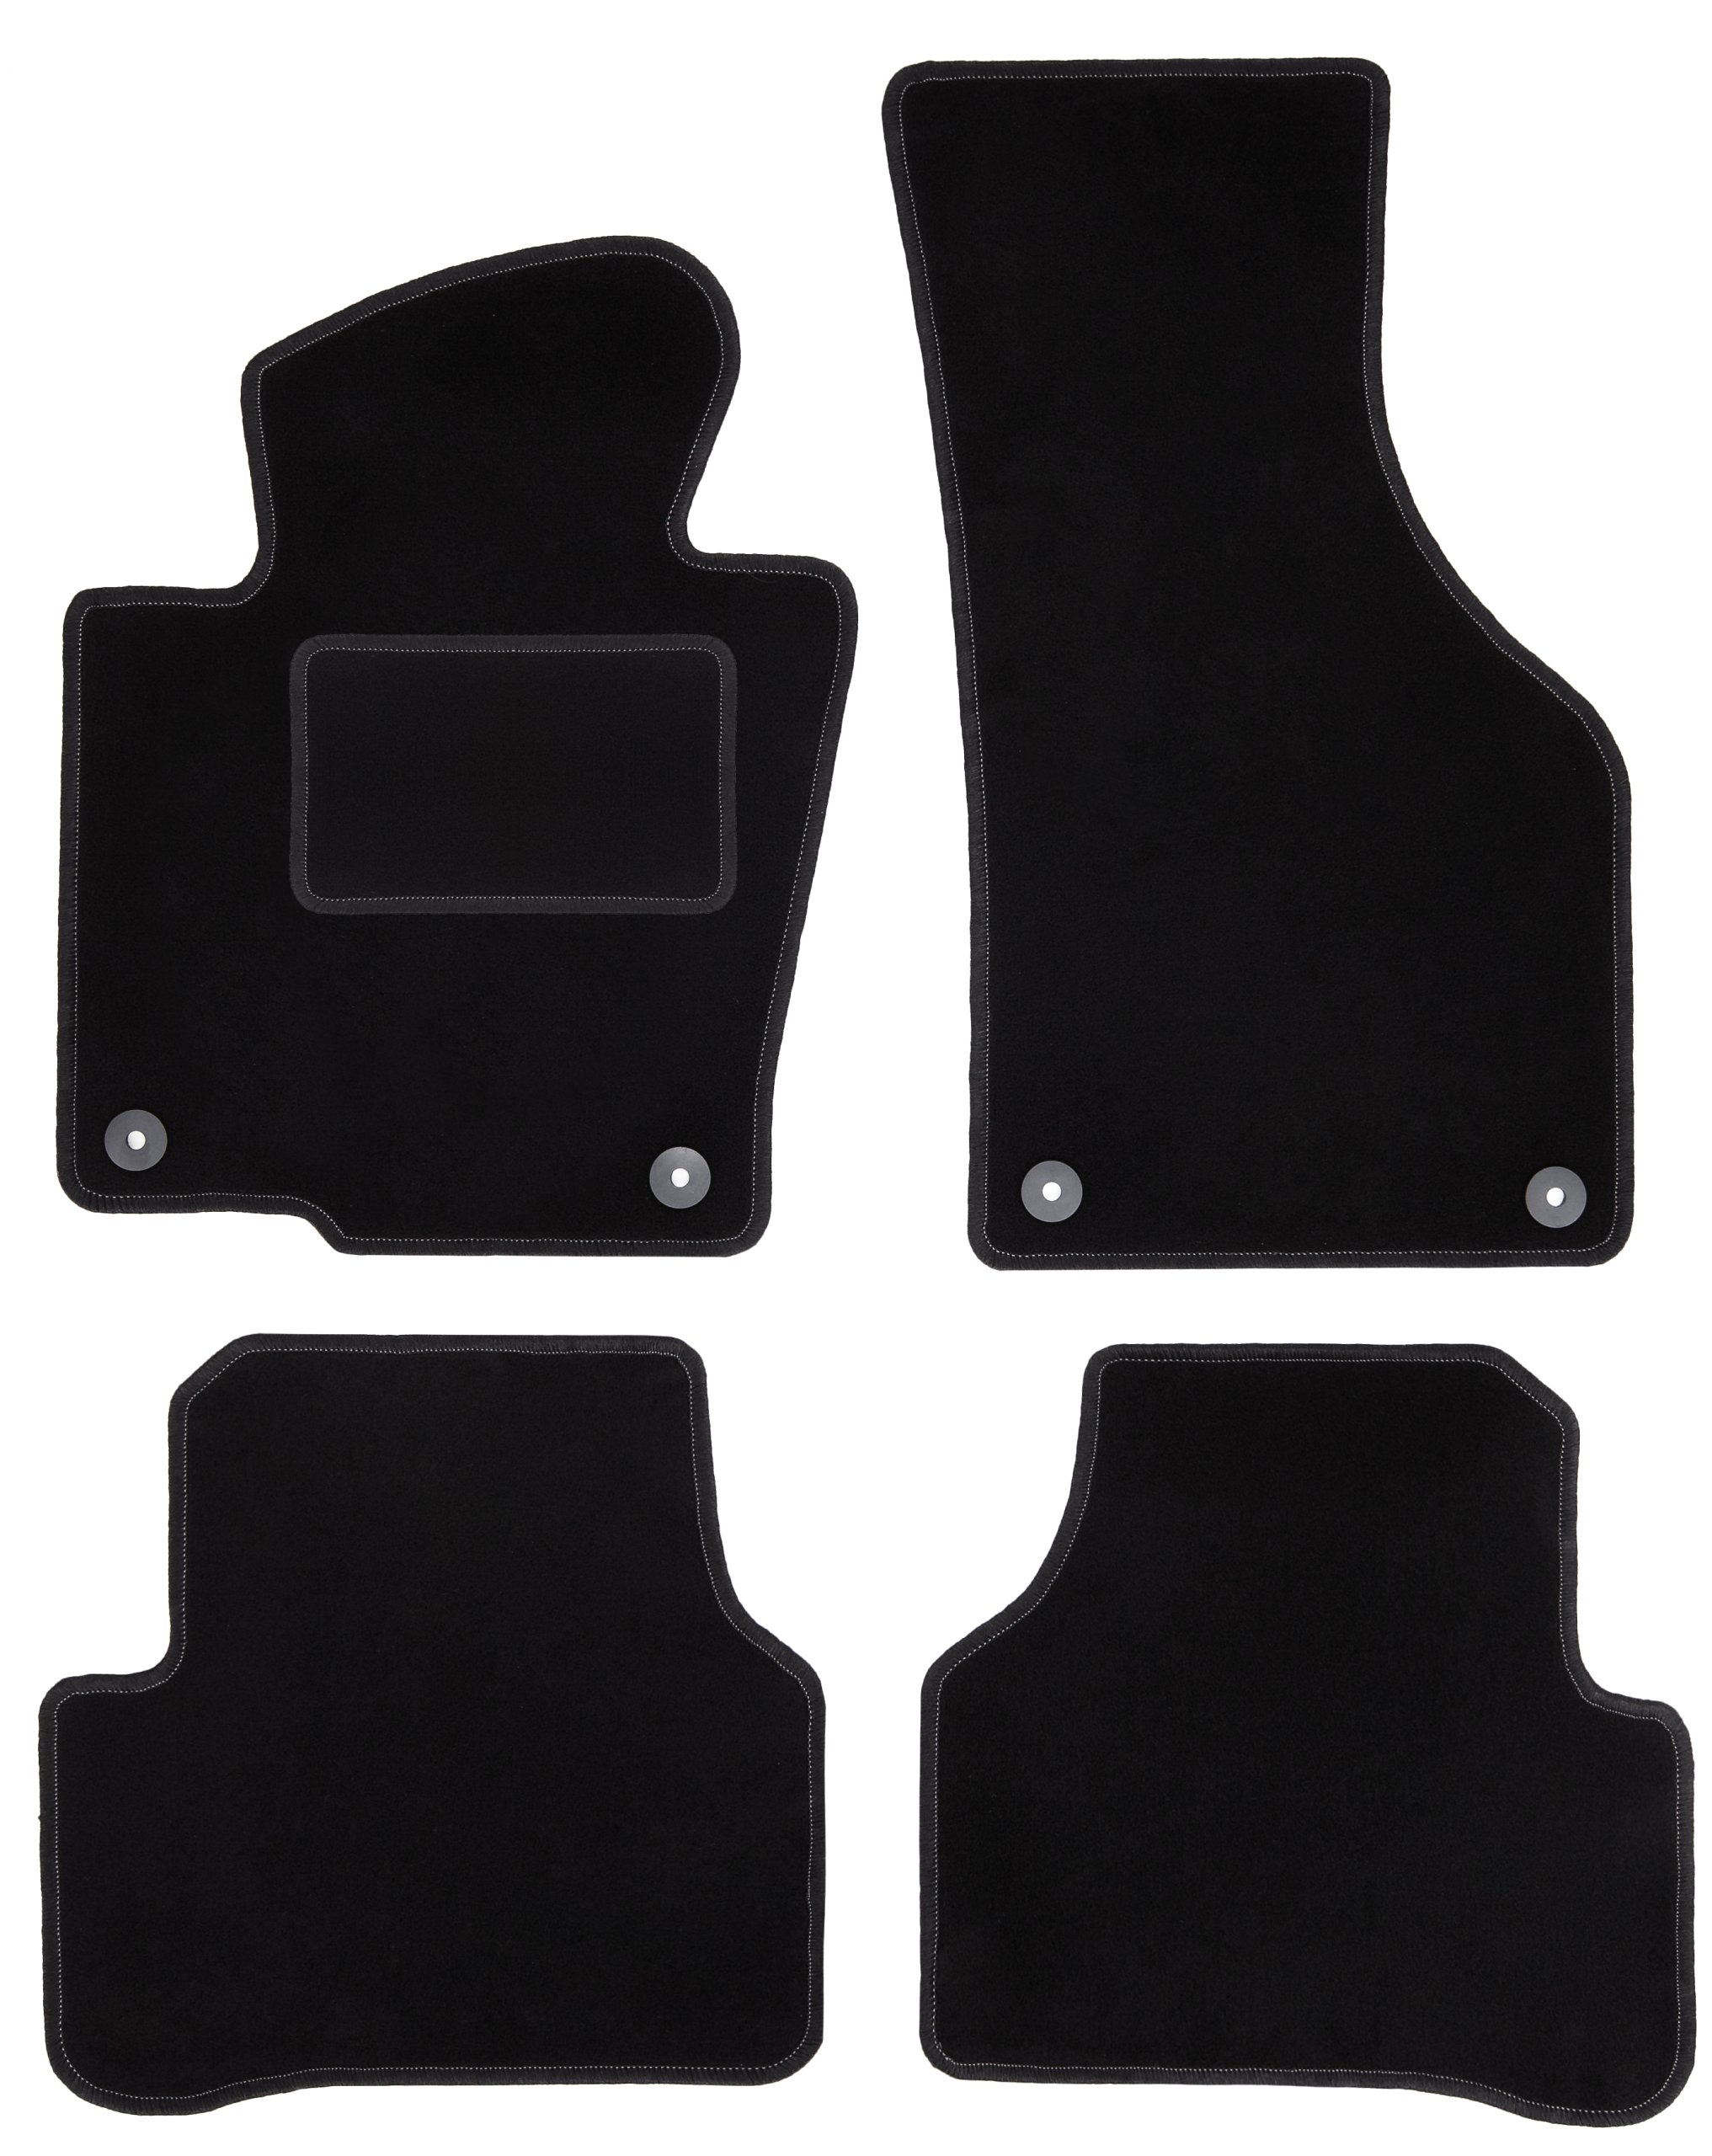 dywaniki CARLUX czarne do: VW Passat B6 / B7 / CC